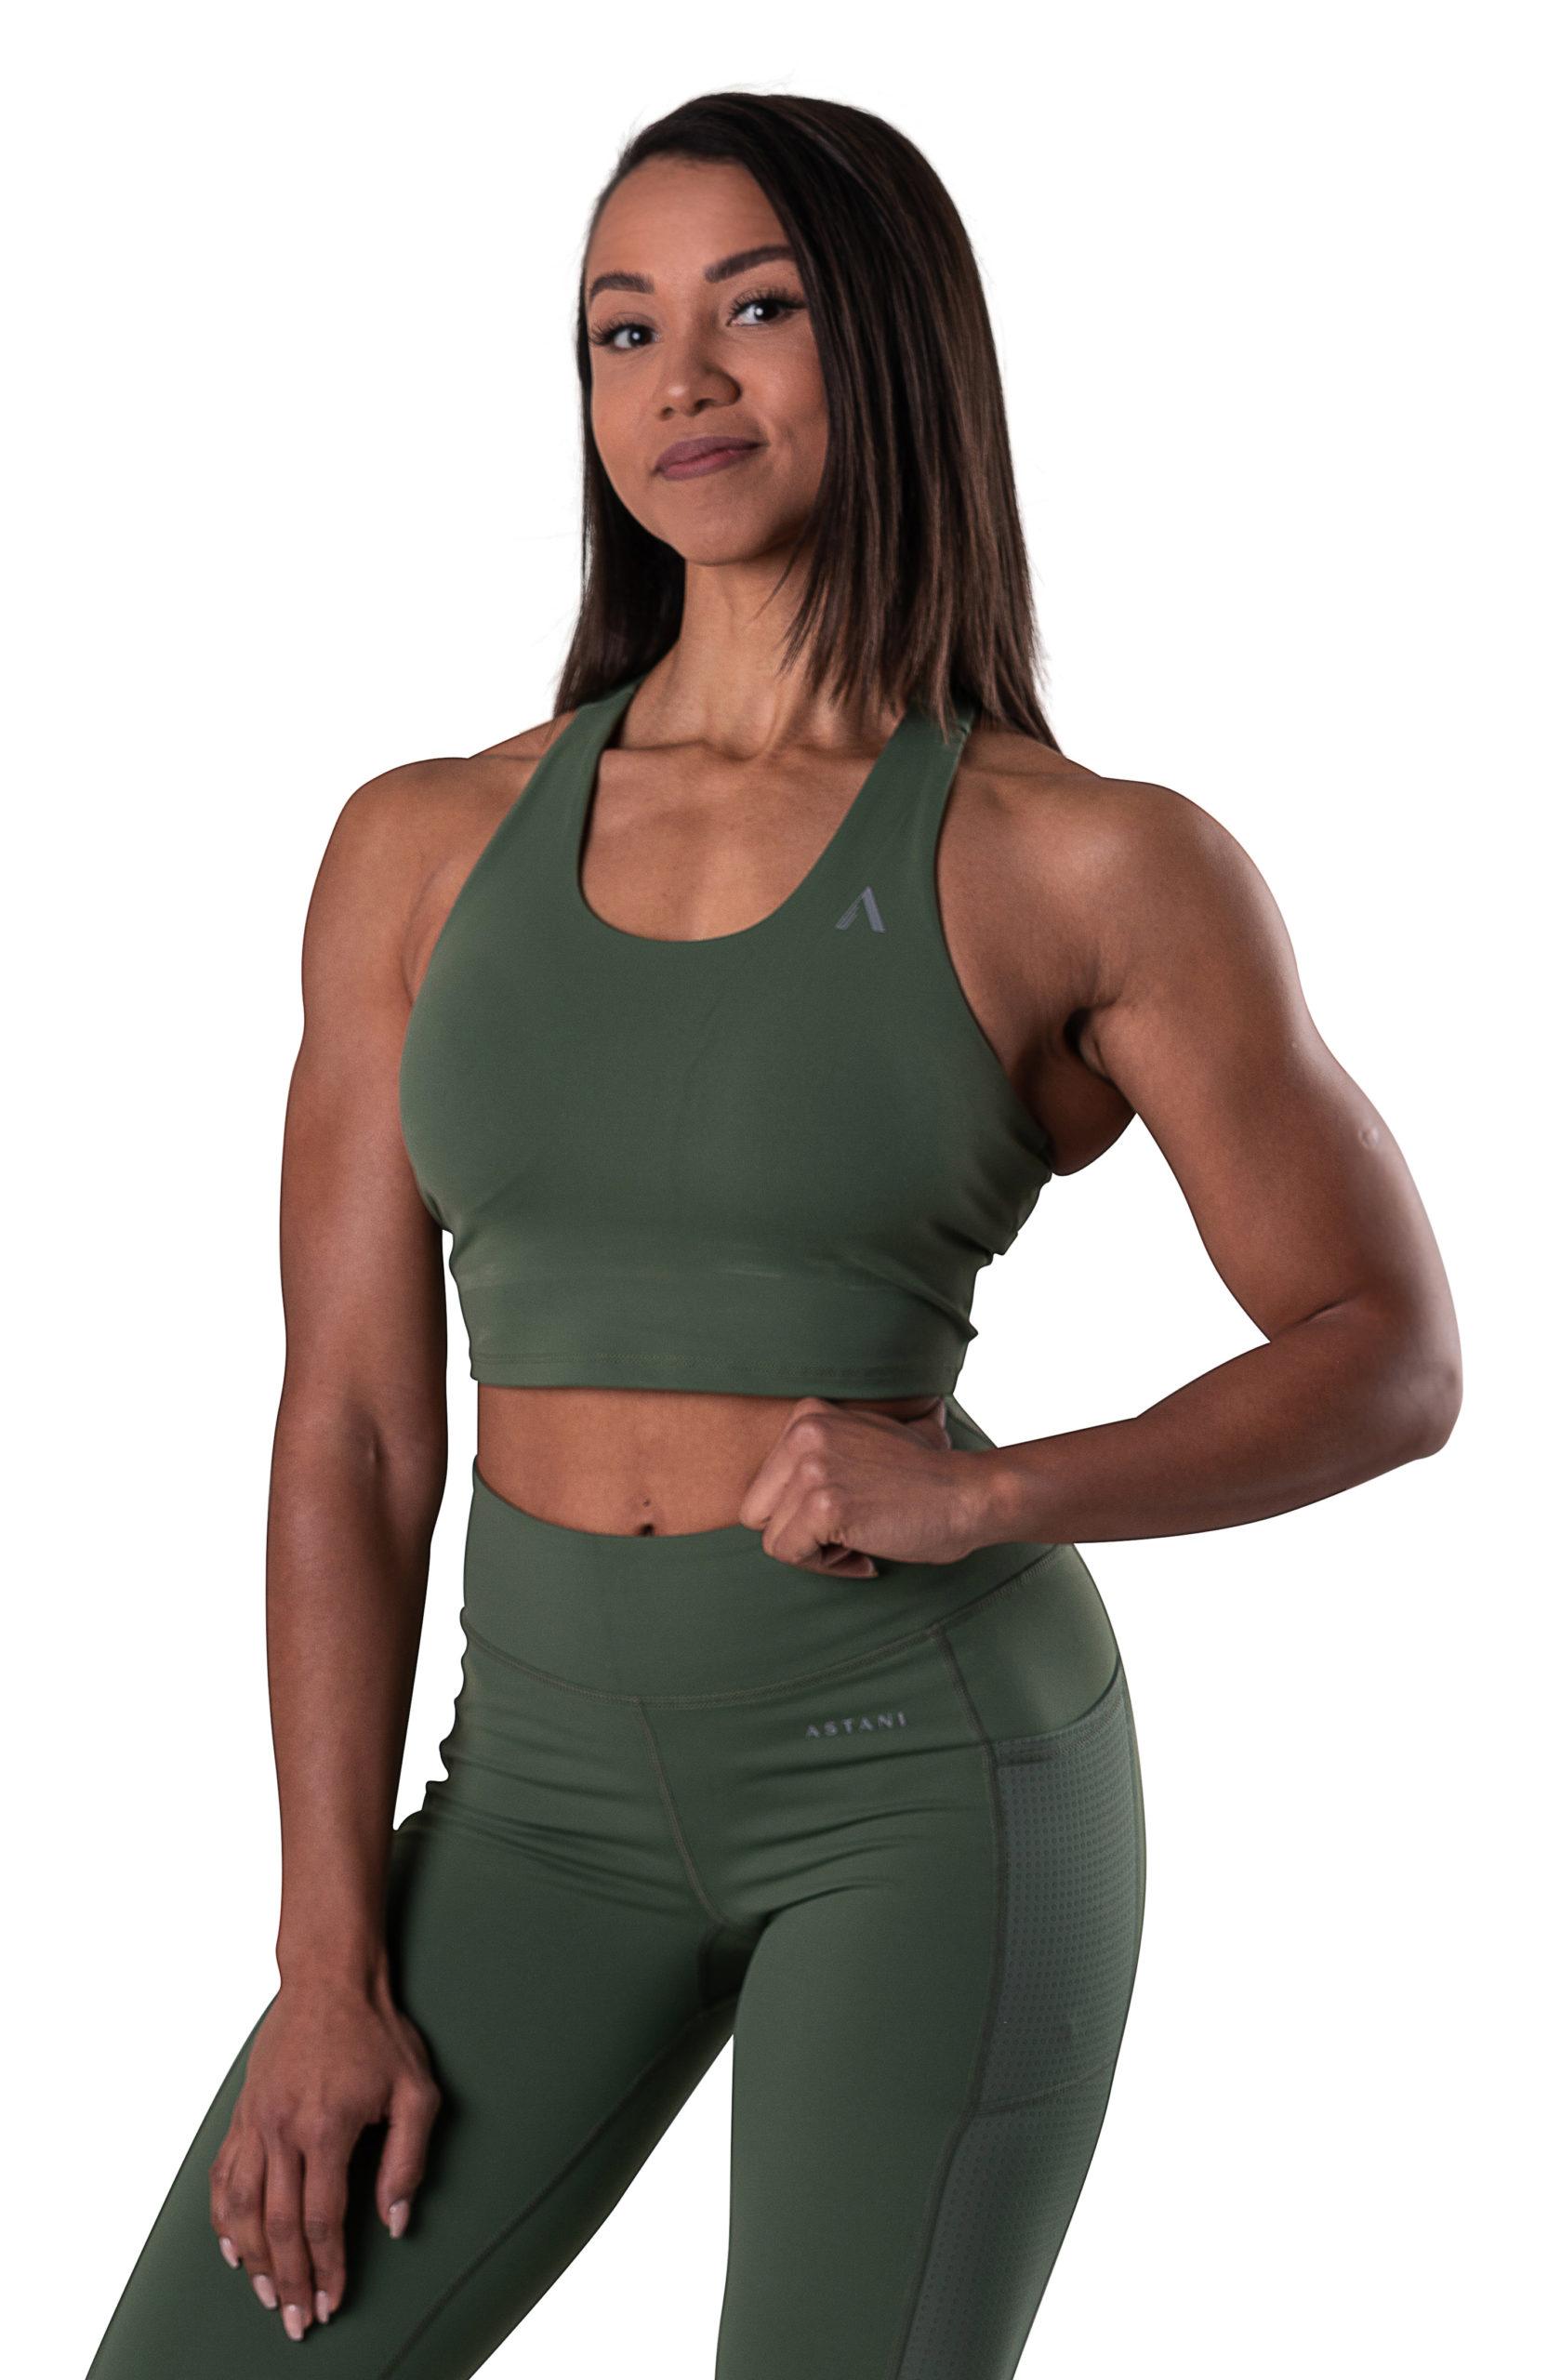 astaniwear-elegance-croptop-green-front cropped